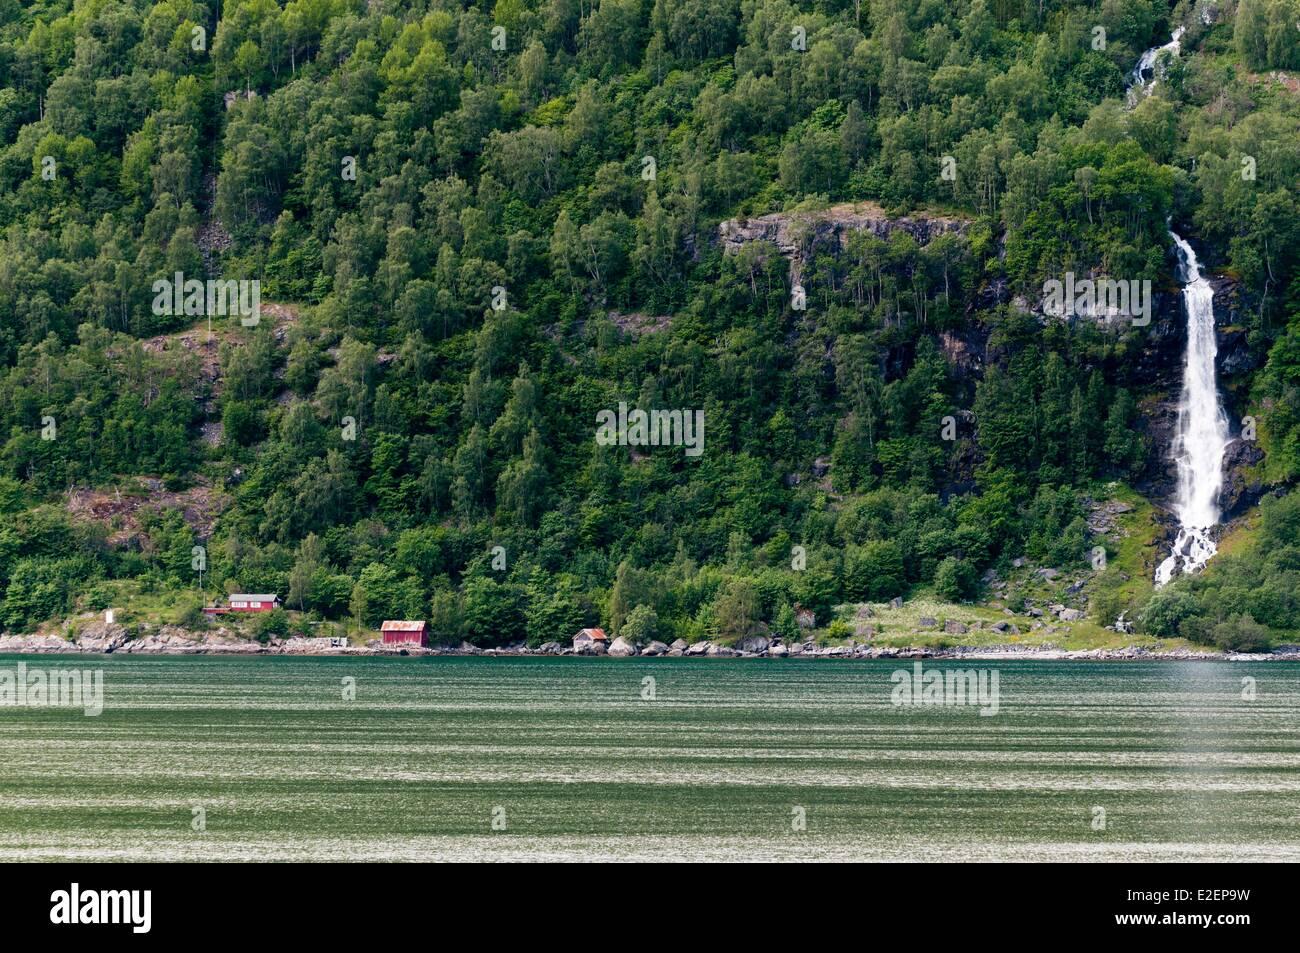 Norway, More og Romsdal County, Geiranger - Stock Image